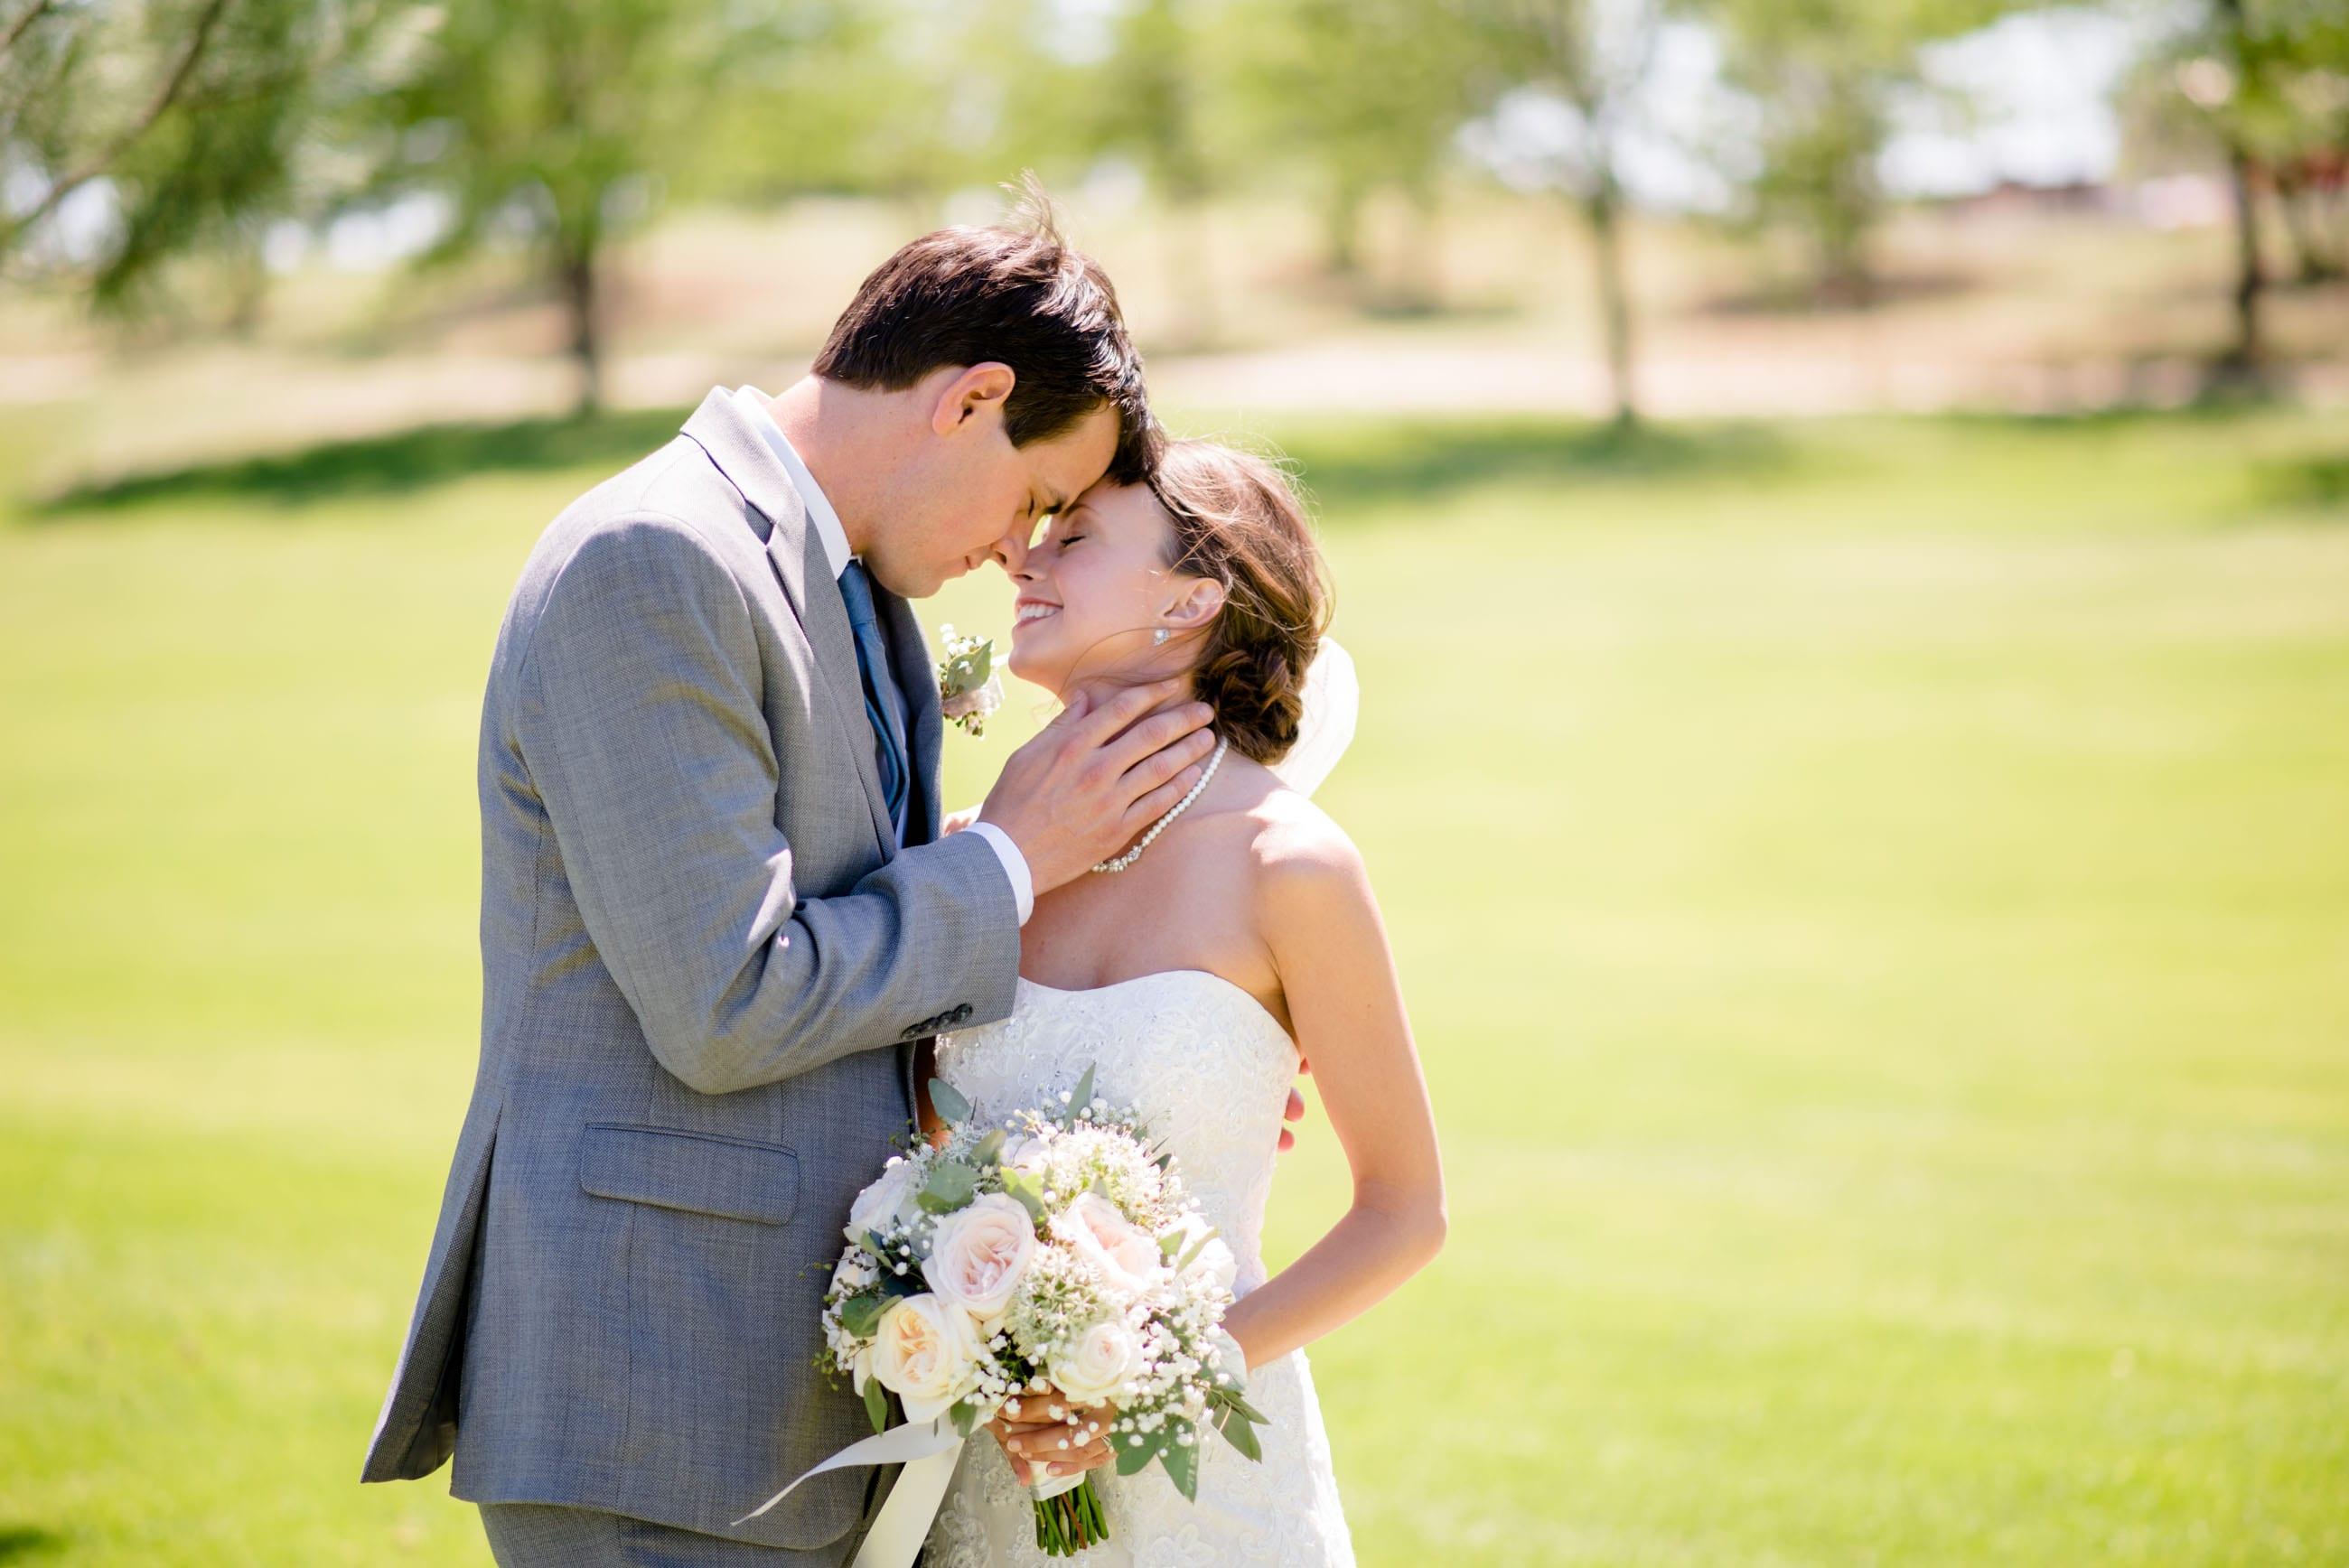 Northeastern Colorado Wedding | Northeastern Colorado Wedding Photographer